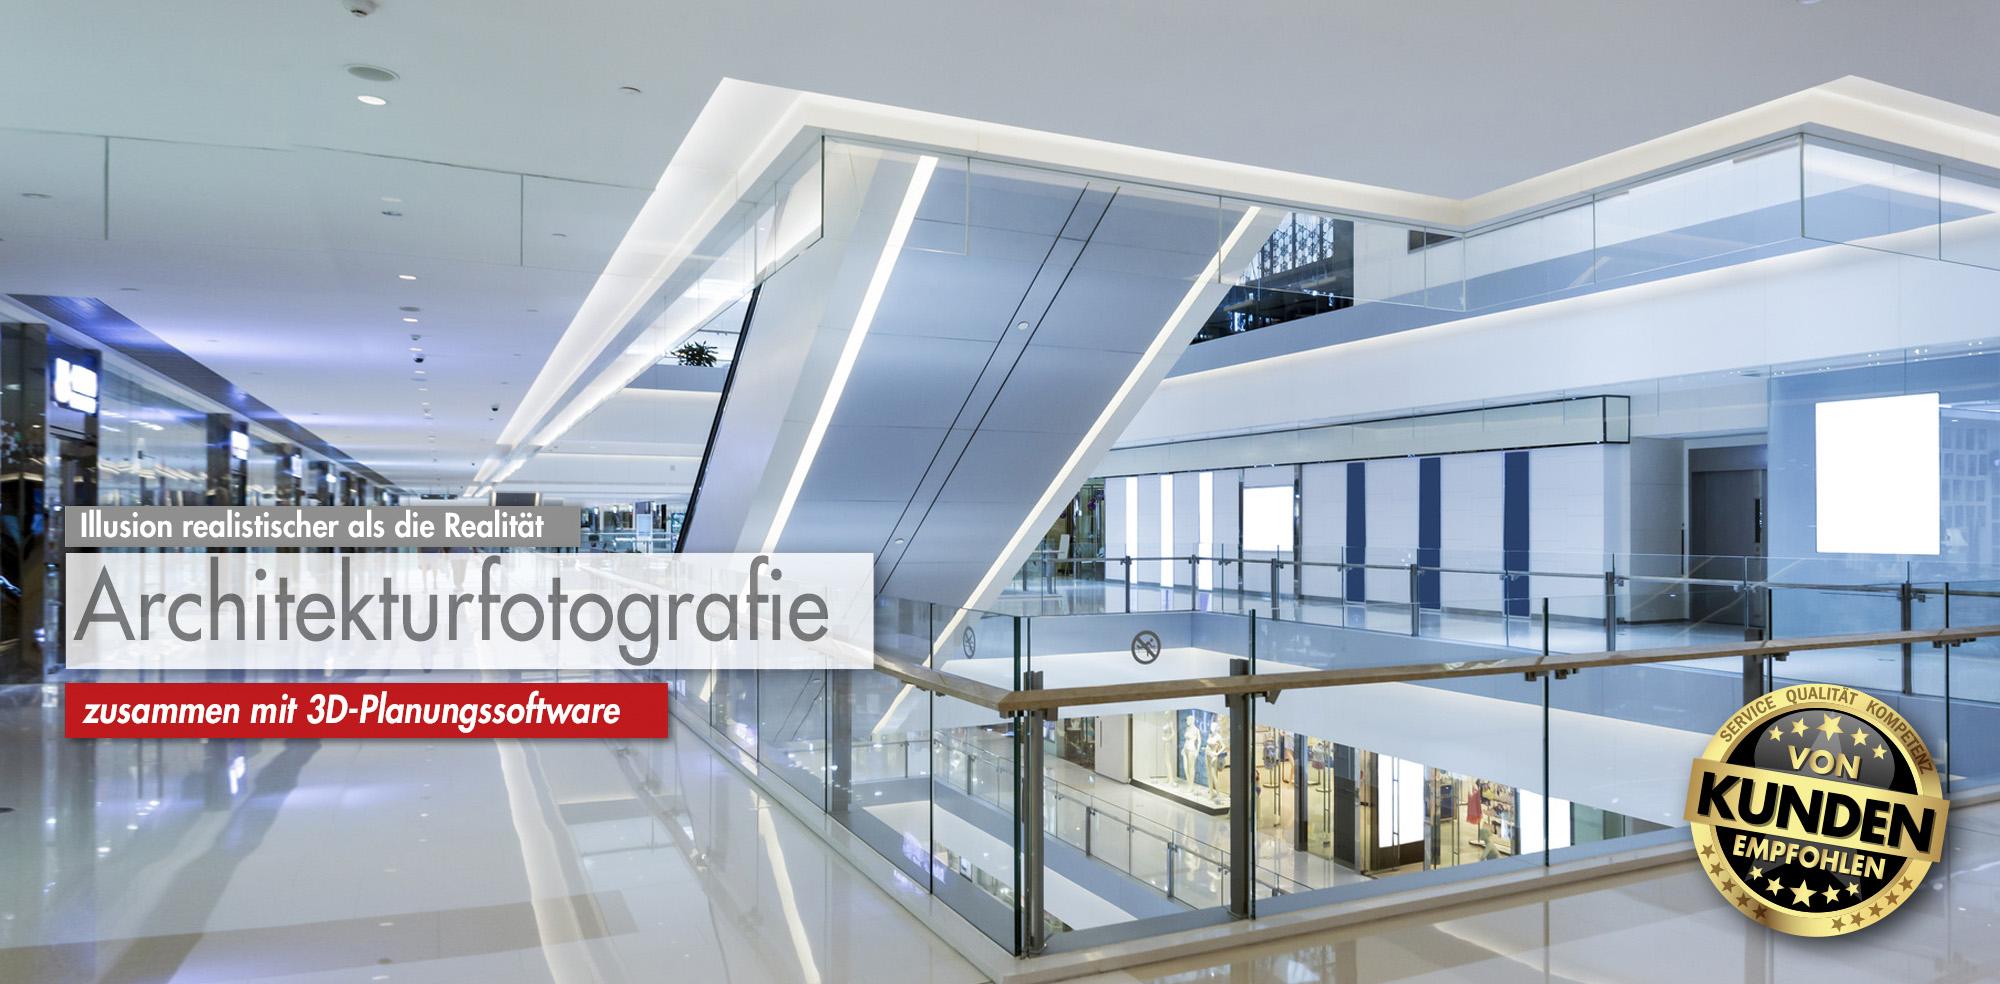 Architekturfotografie und Werbefotografie@blickfang2_fotostudio_filmstudio